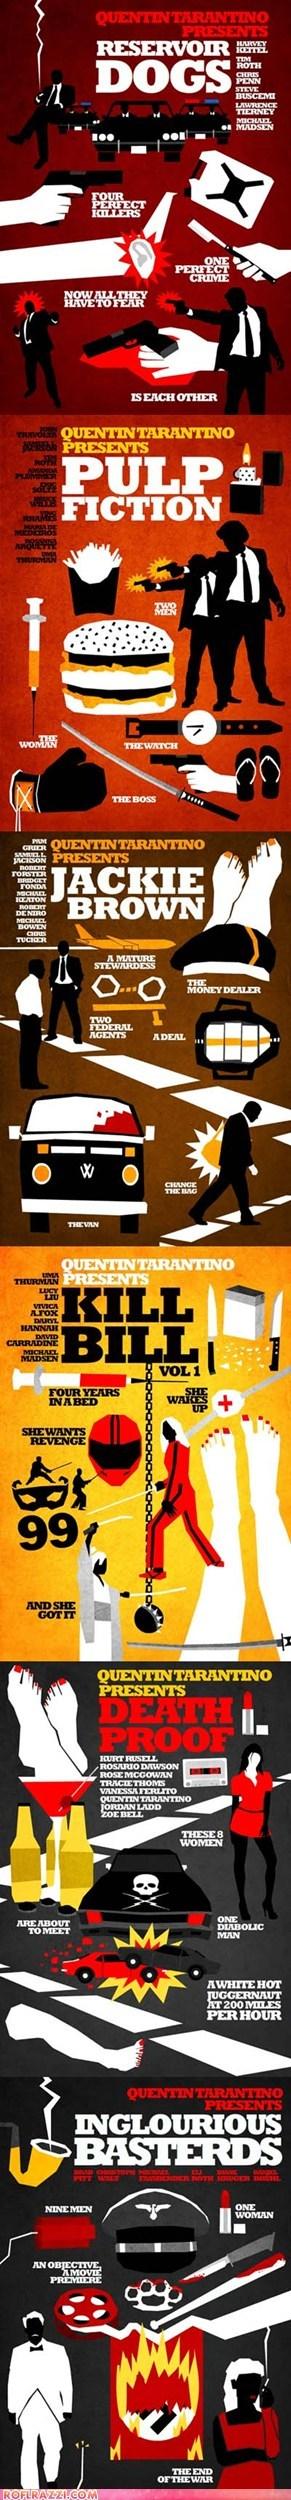 art celeb cool director Kill Bill Movie posters pulp fiction quentin tarantino - 6349124096